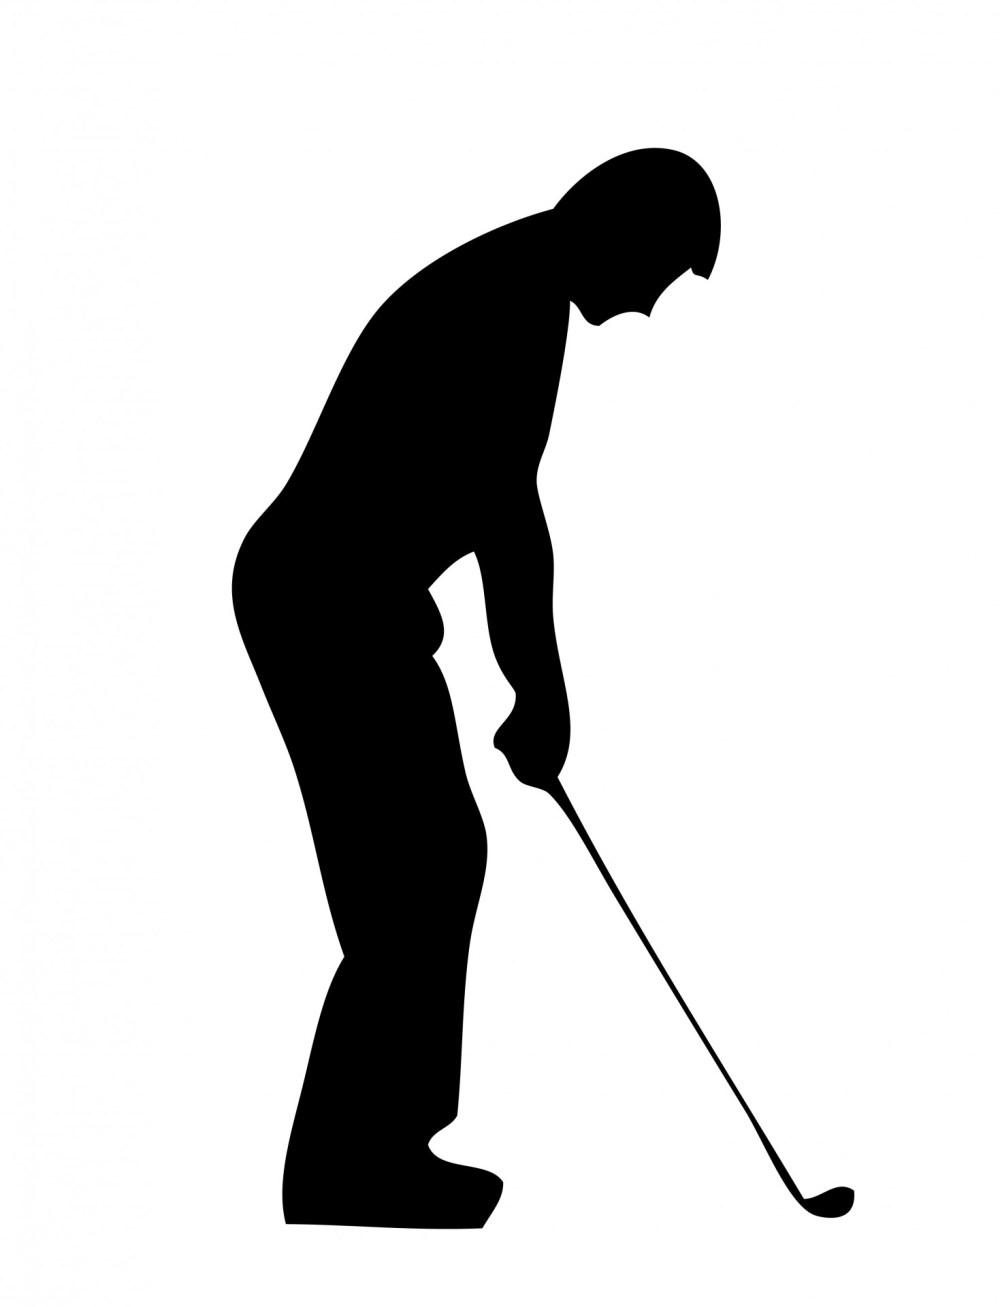 medium resolution of golf silhouette clipart 3